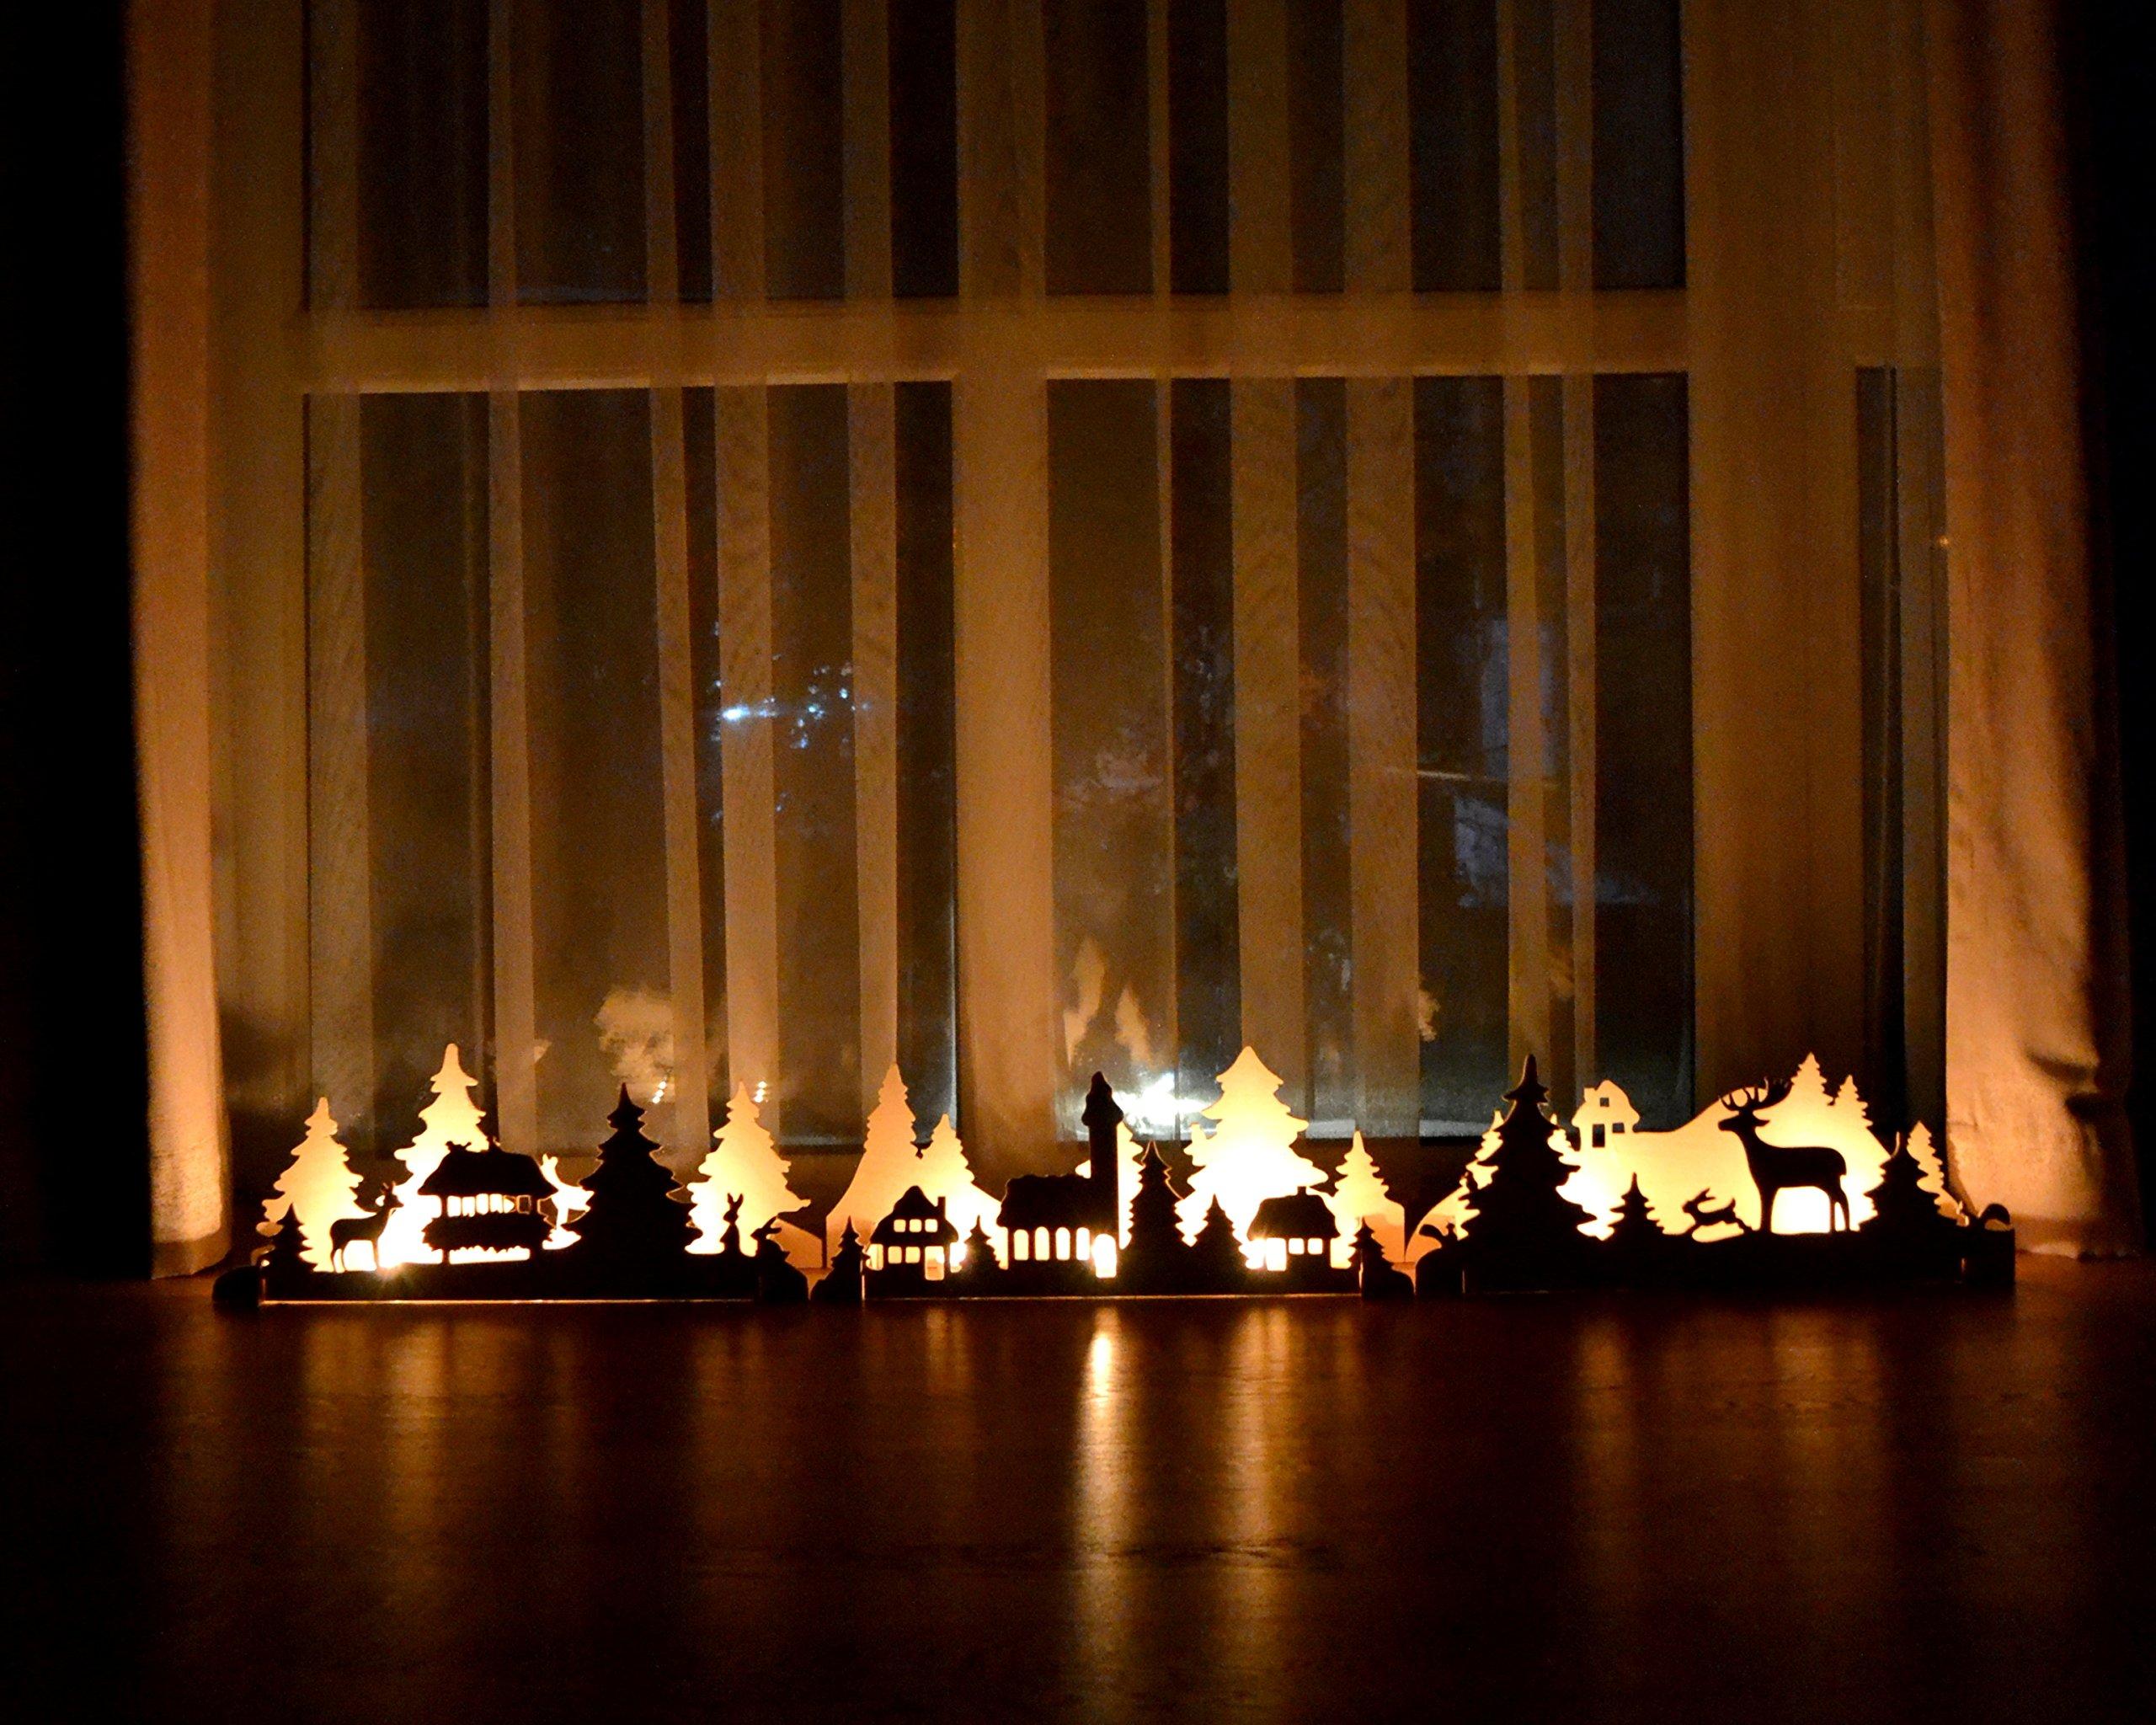 Christmas Lights, Christmas mantle decor, Mantle Candle Holders, Rustic Mantle Decor, Wood Candlesticks, wooden candlesticks, wooden candle holders rustic